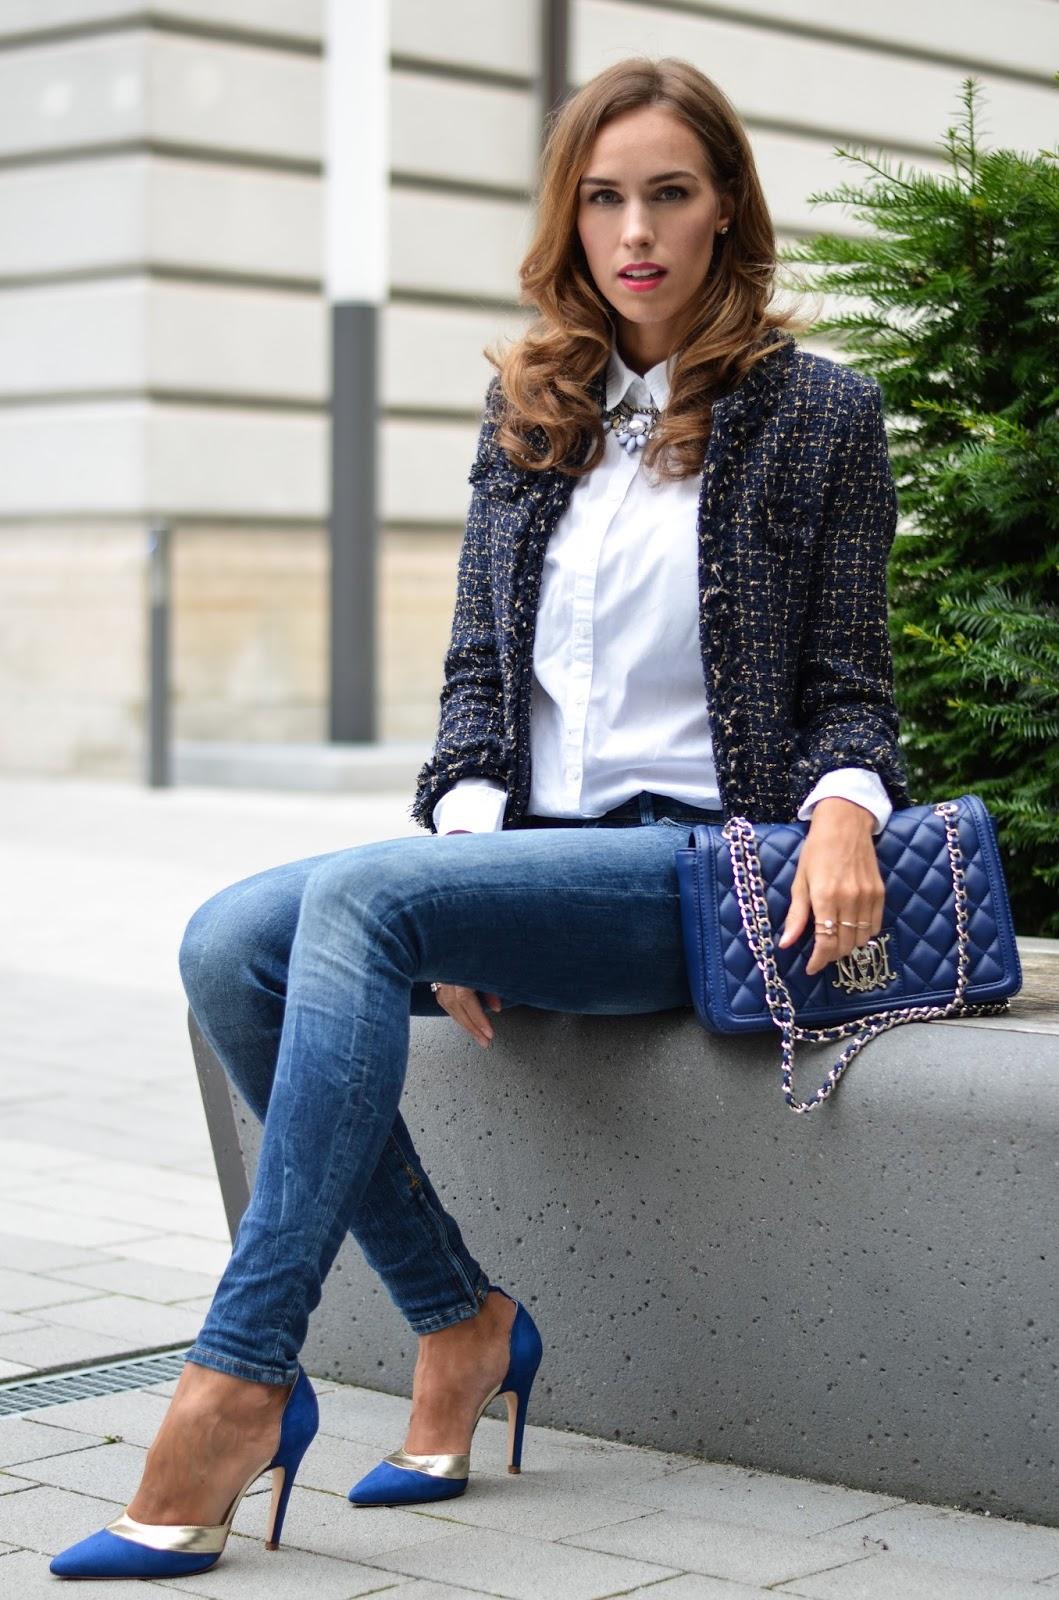 kristjaana mere german munich fashion blogger